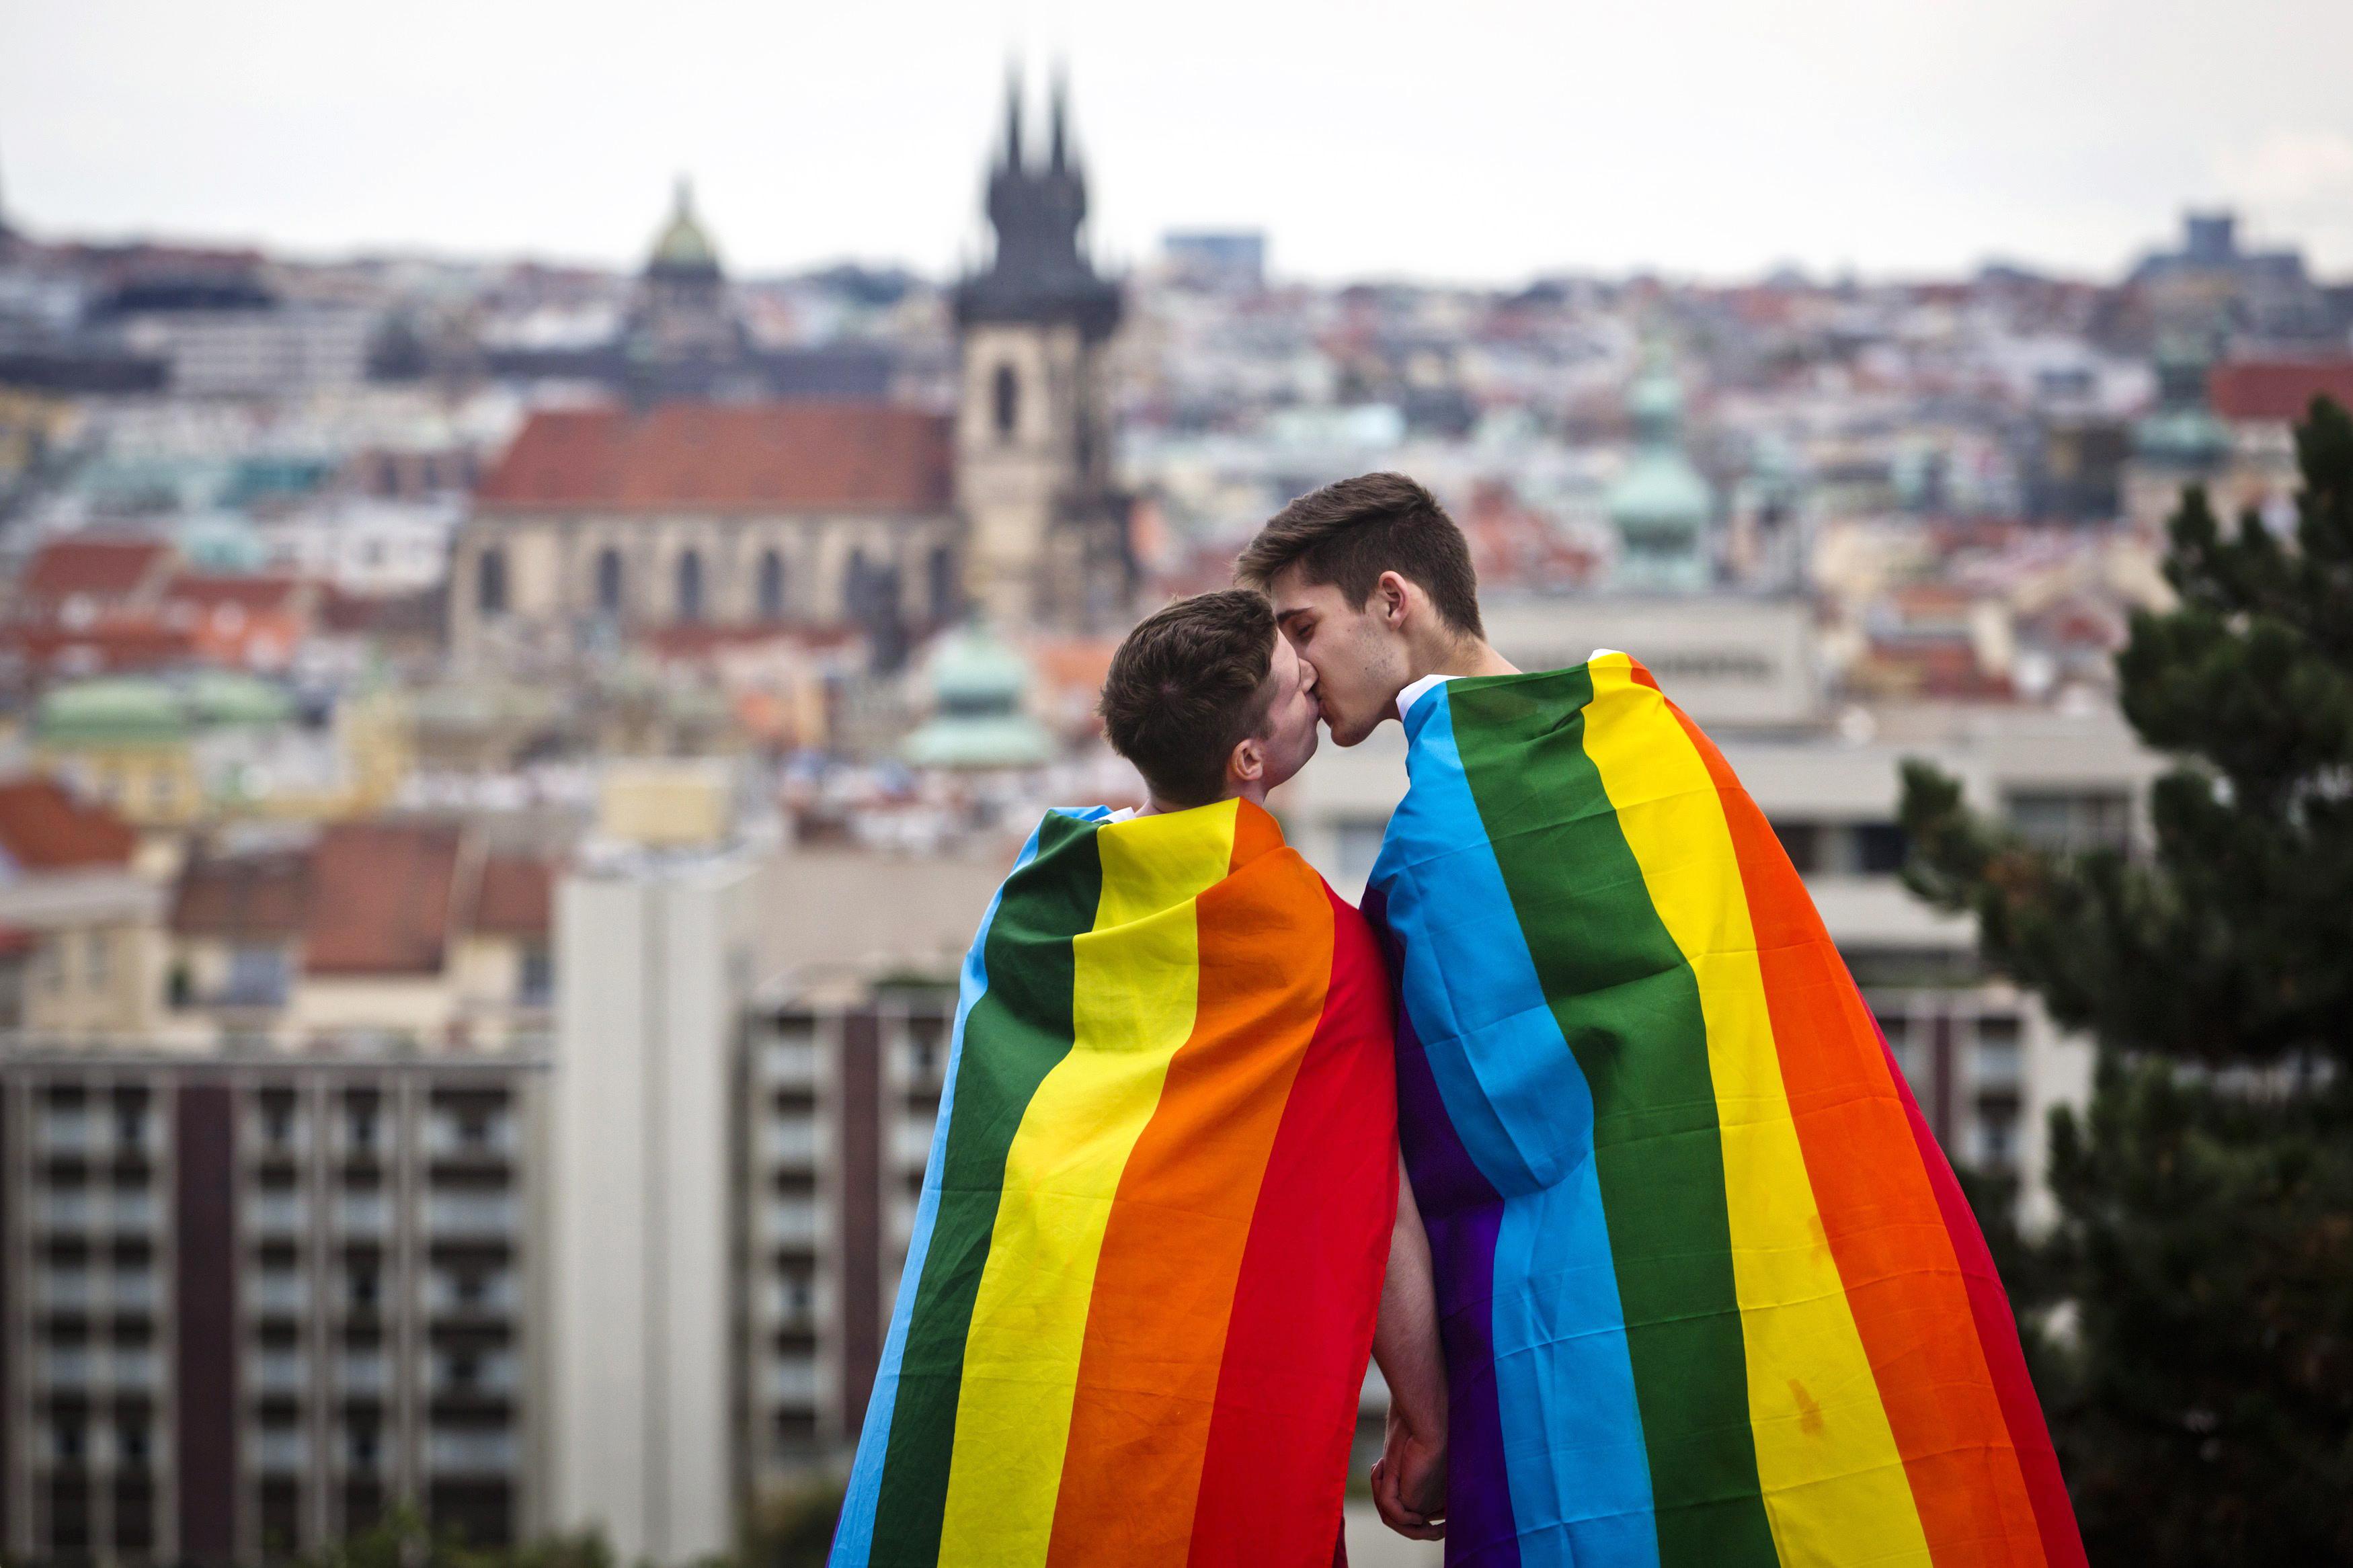 Partnersuche Homosexuell